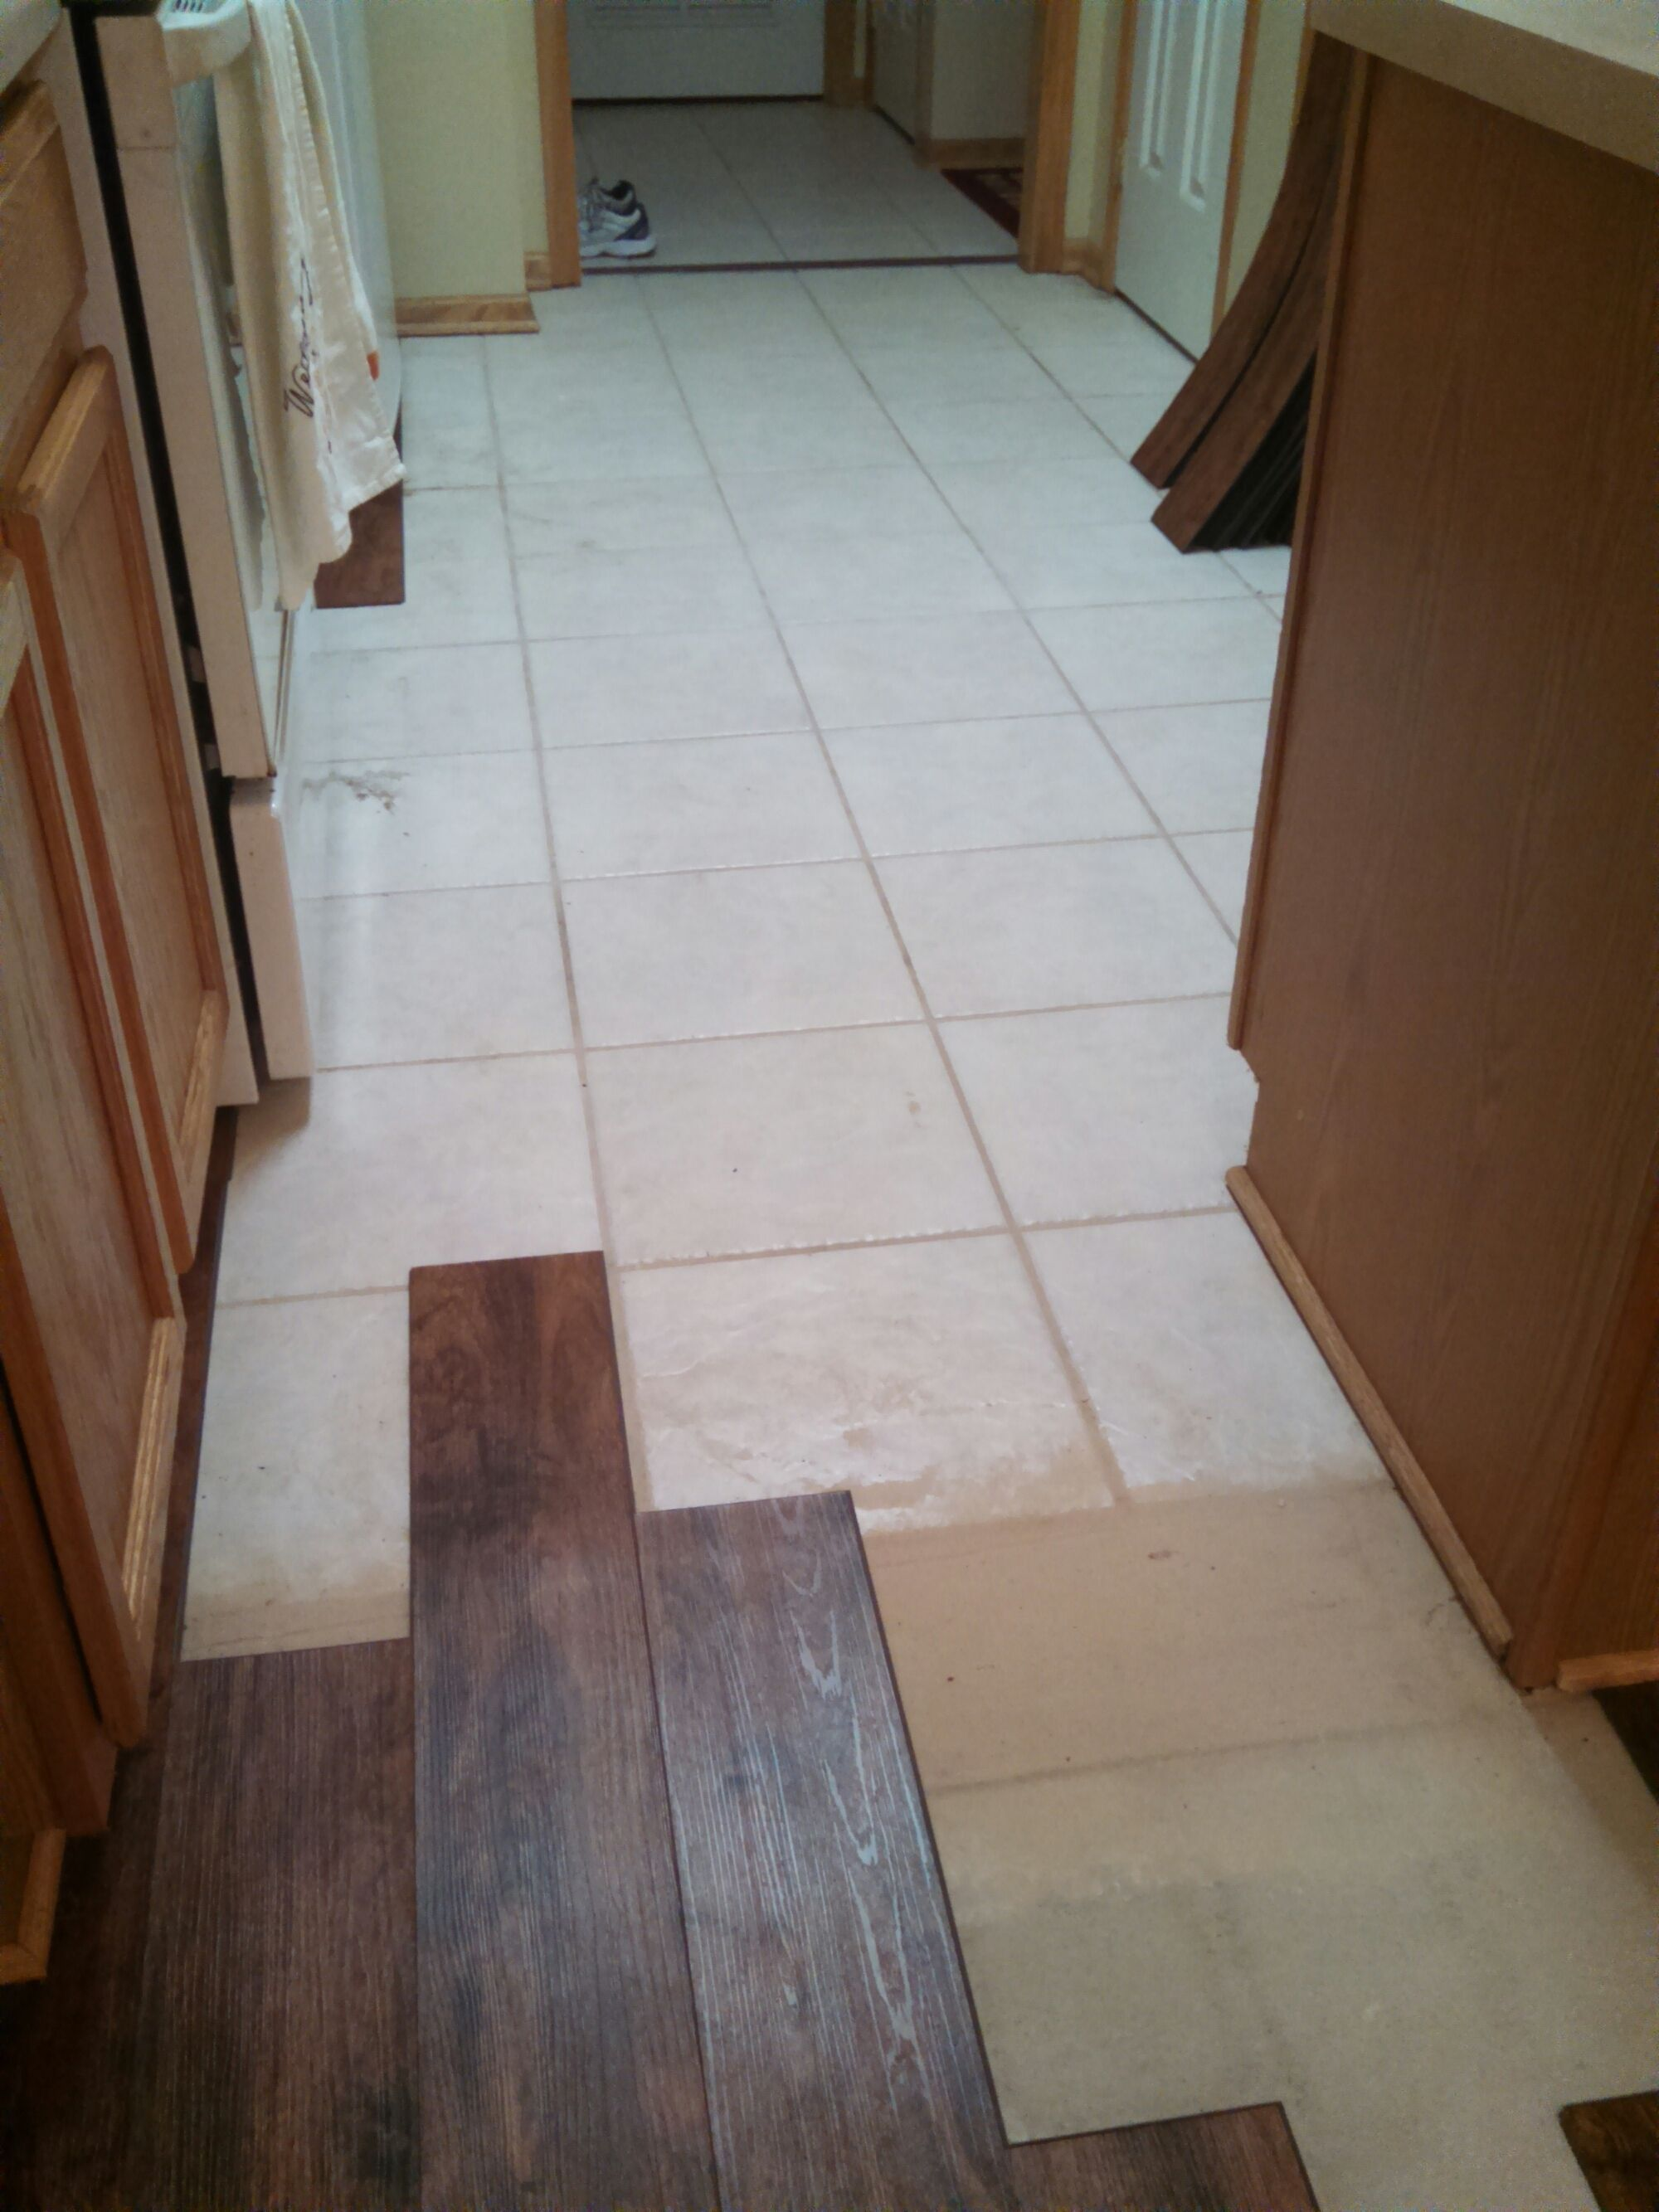 Laying Laminate Wood Flooring Over